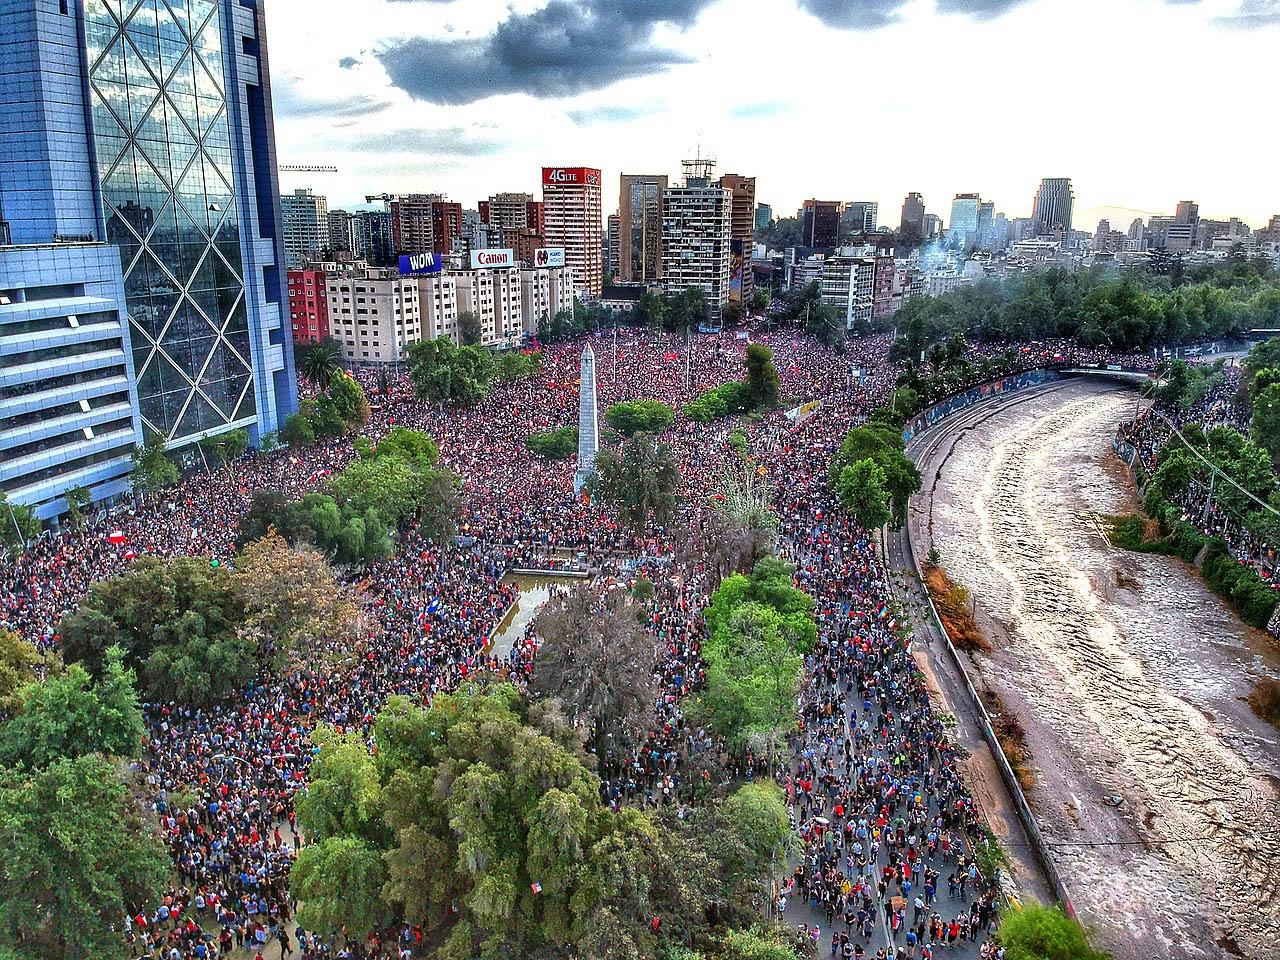 Протестующие на площади Бакуедано в Сантьяго. Чили, 2019 год.